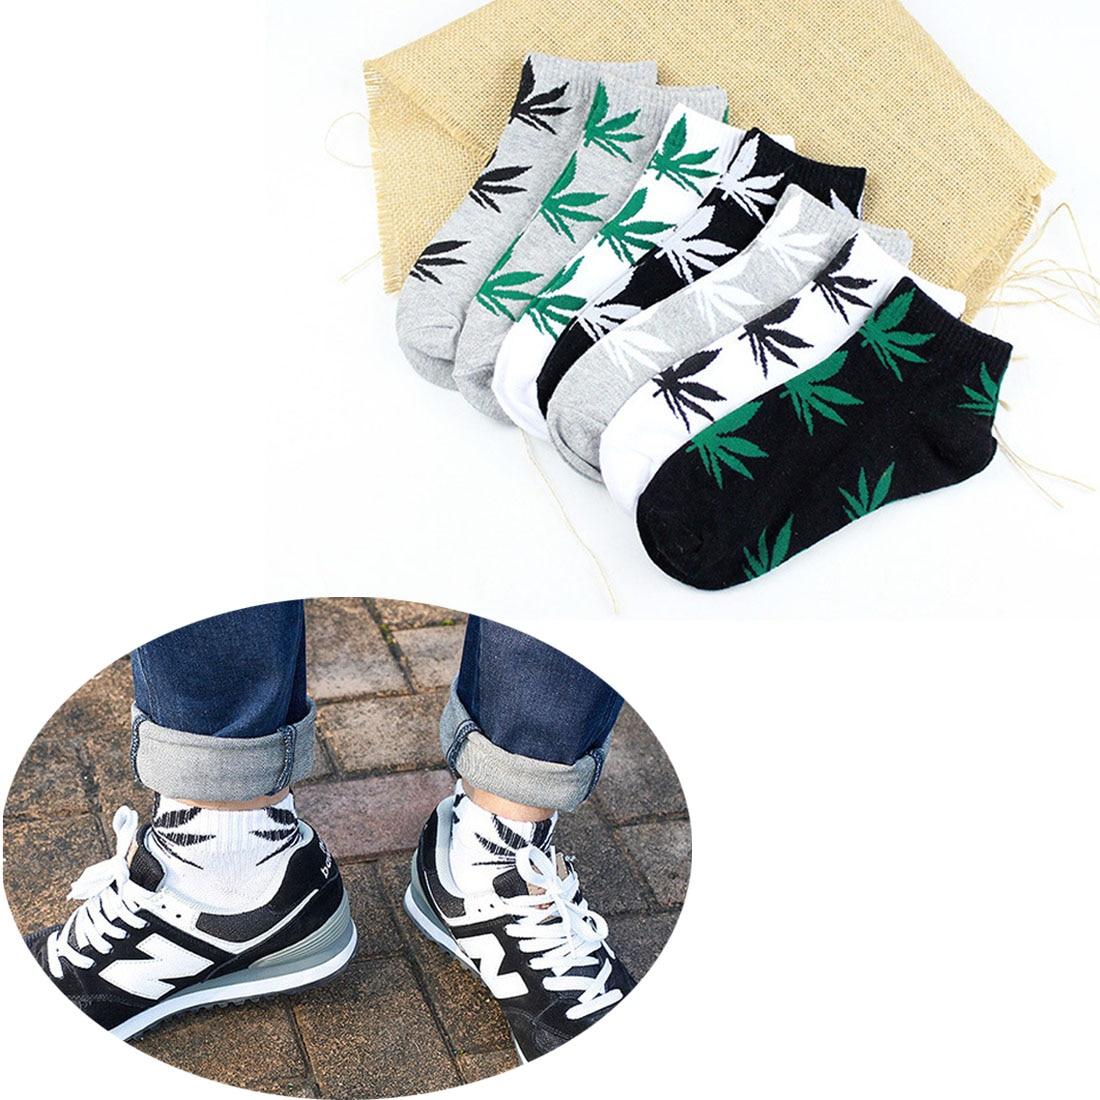 2019 Hot Fashion Men Women's Maple Leaf Ankle Socks Cotton Low Cut Couple Weed Socks Novelty Crazy Fun Socks Hip Hop Crew Socks